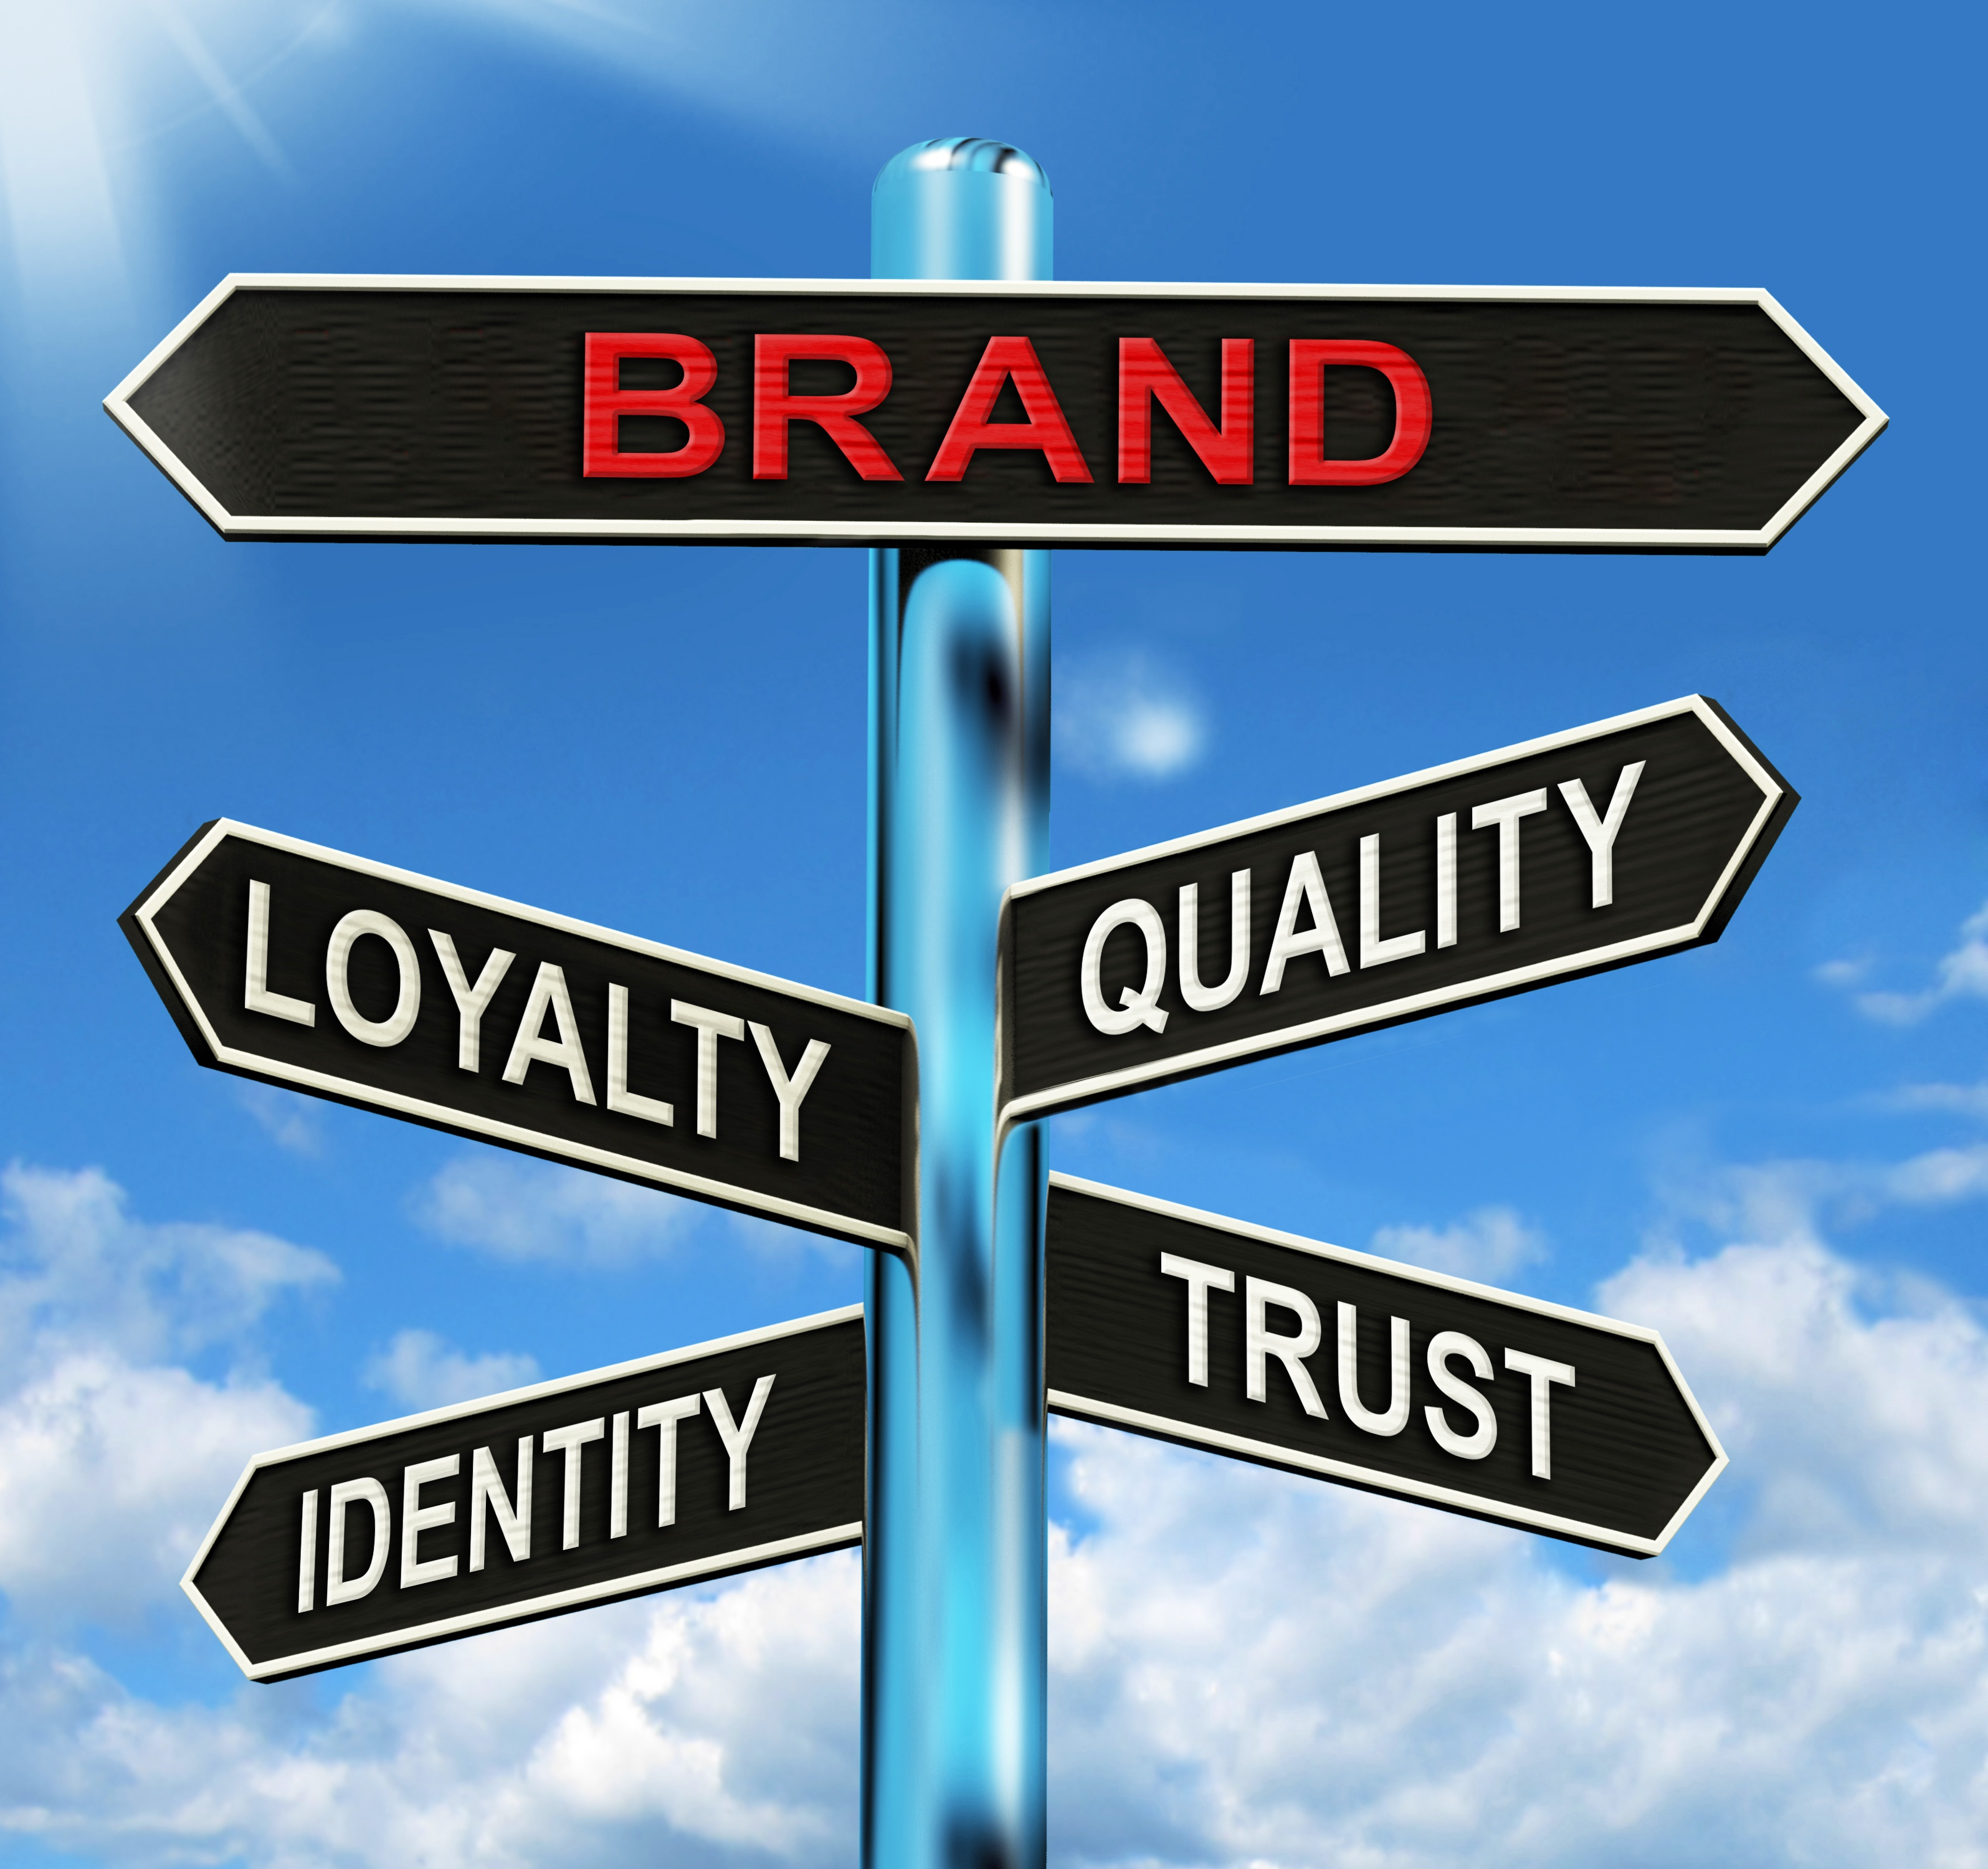 Brand-signpost-ThinkstockPhotos-501795761.jpg